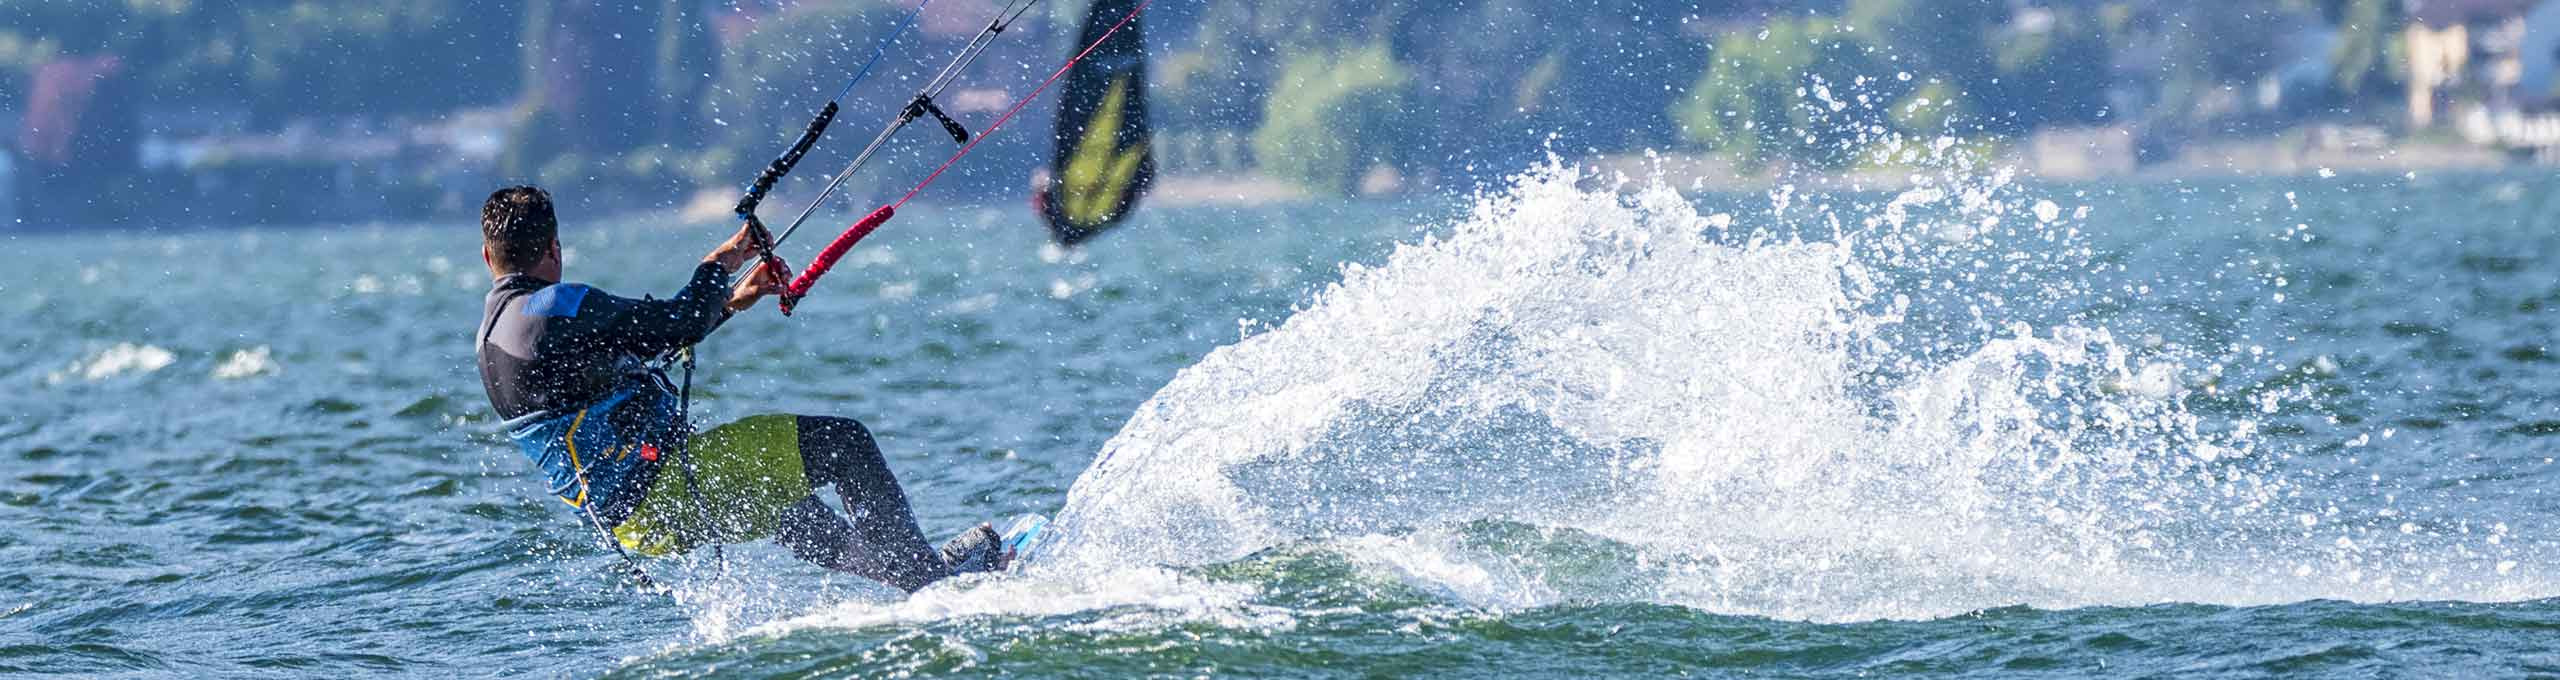 Lago di Como, kitesurfer